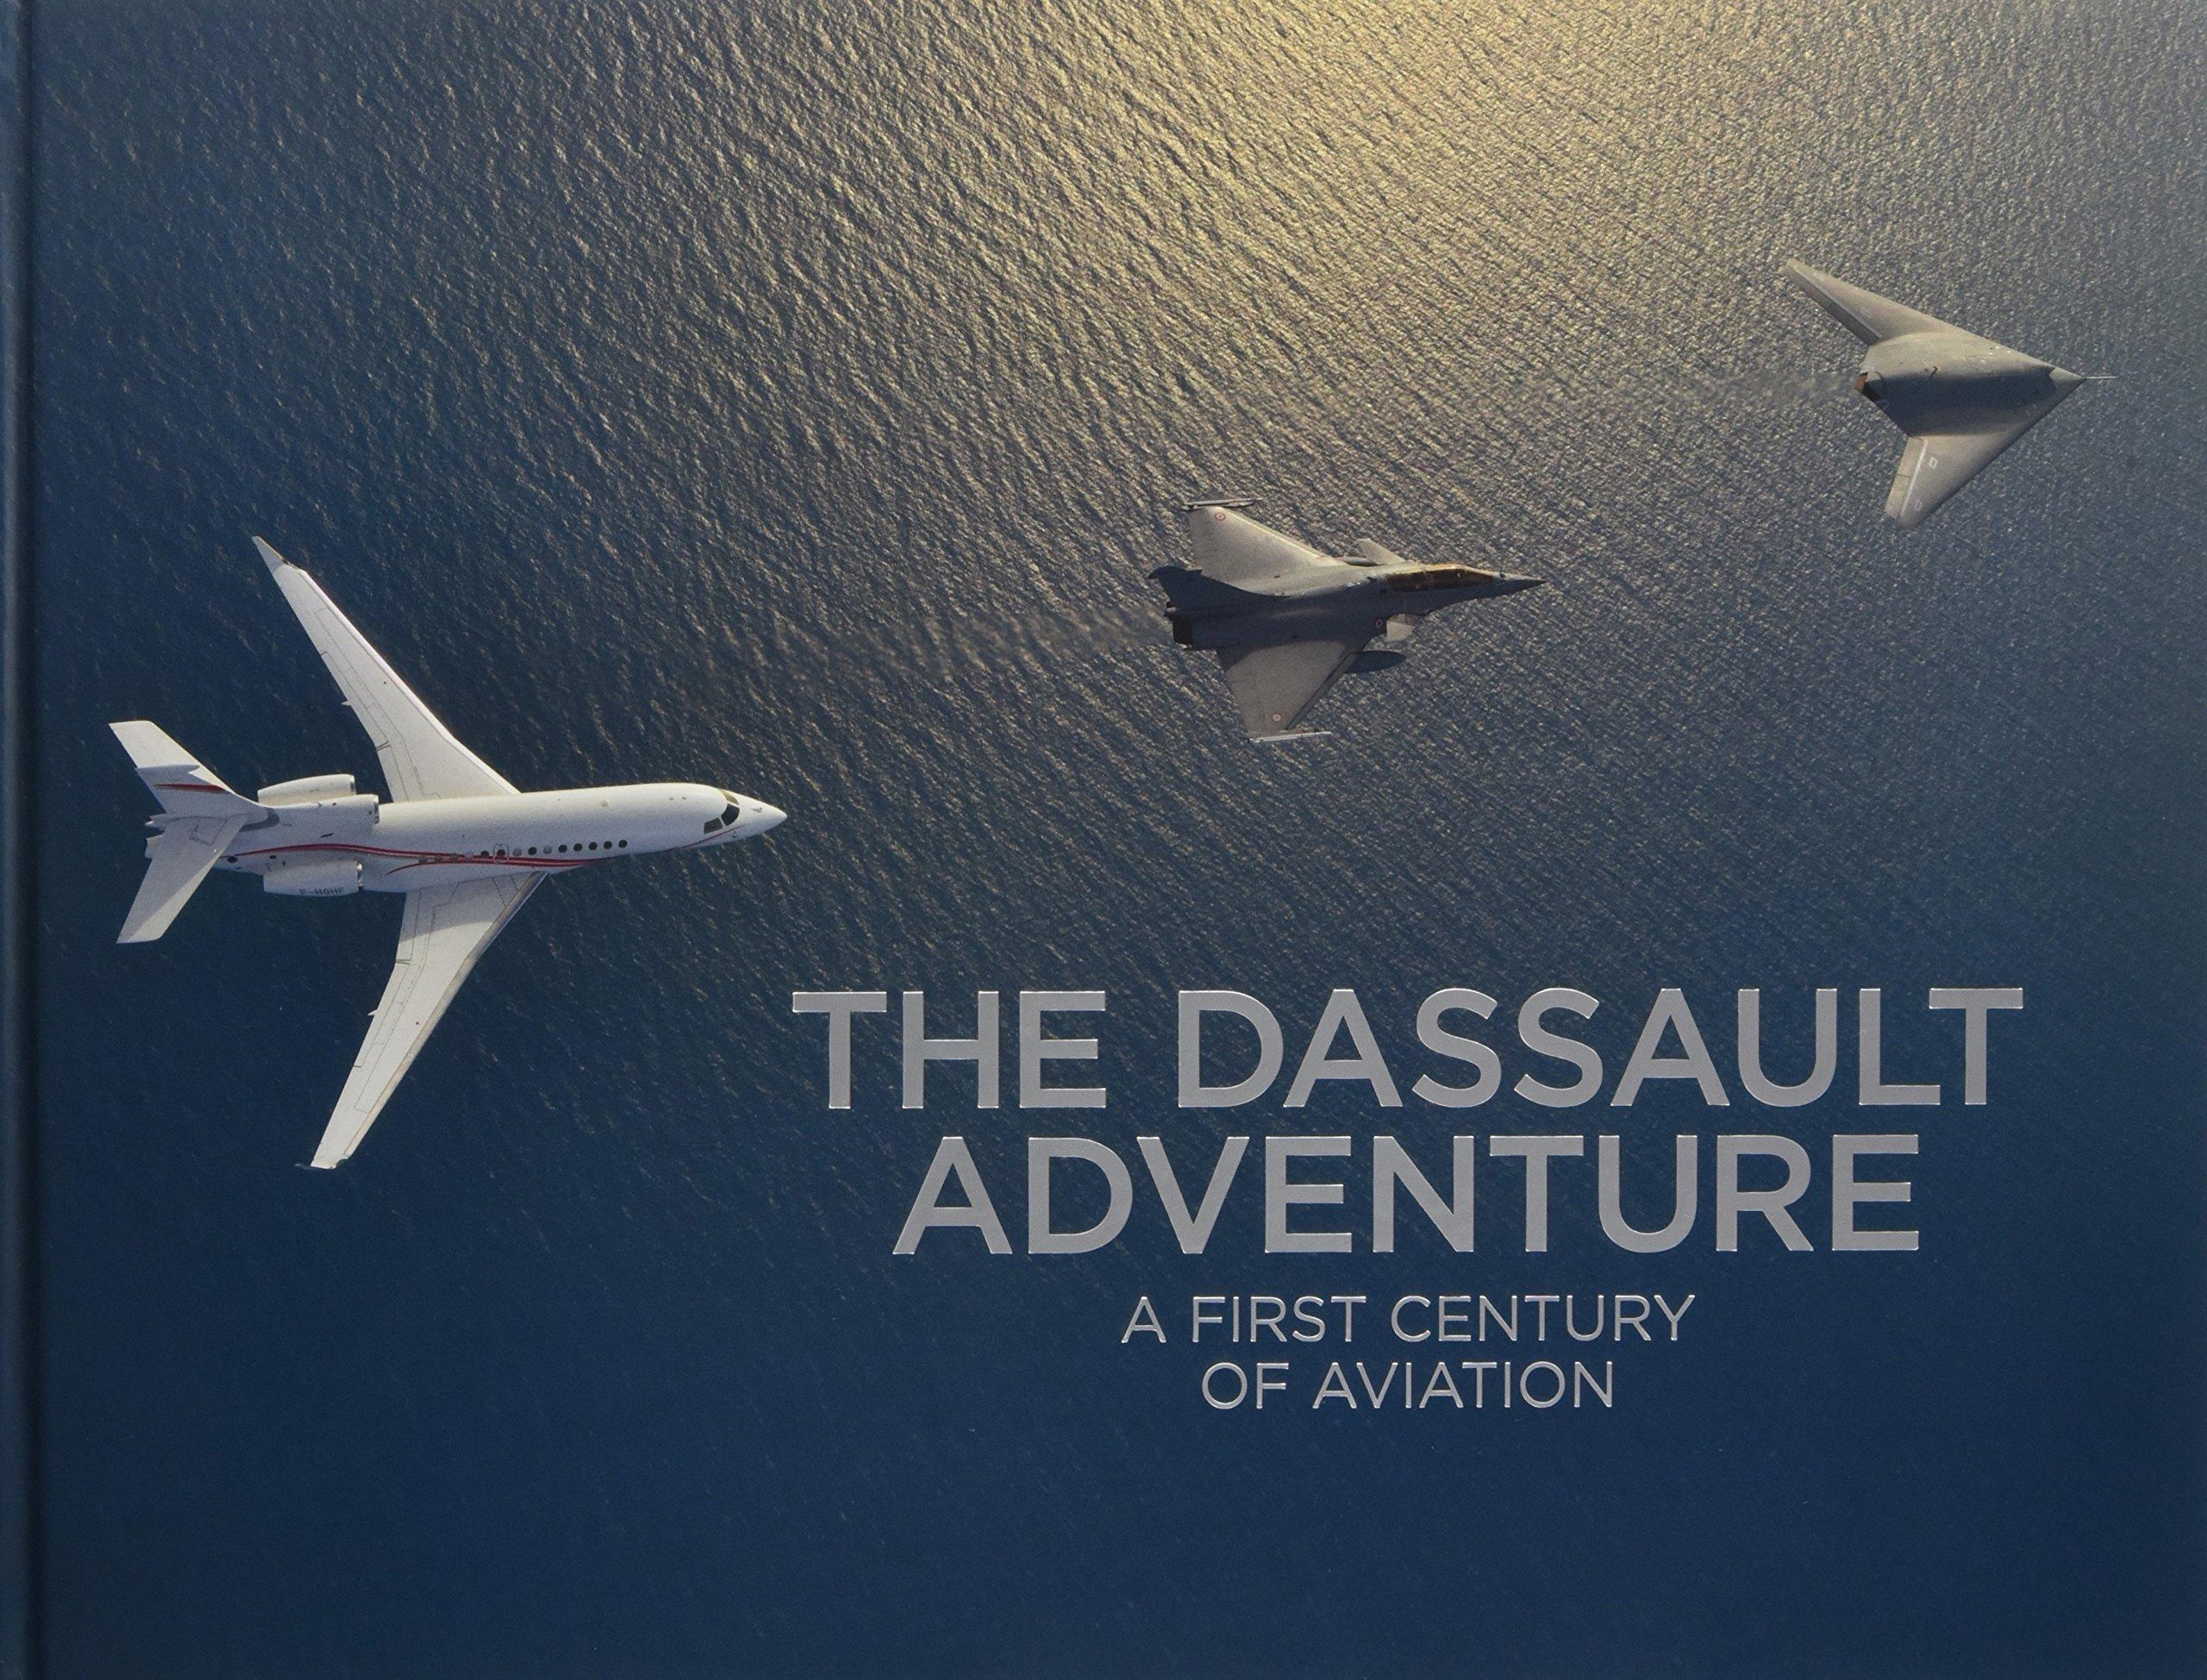 The Dassault Adventure: A First Century of Aviation